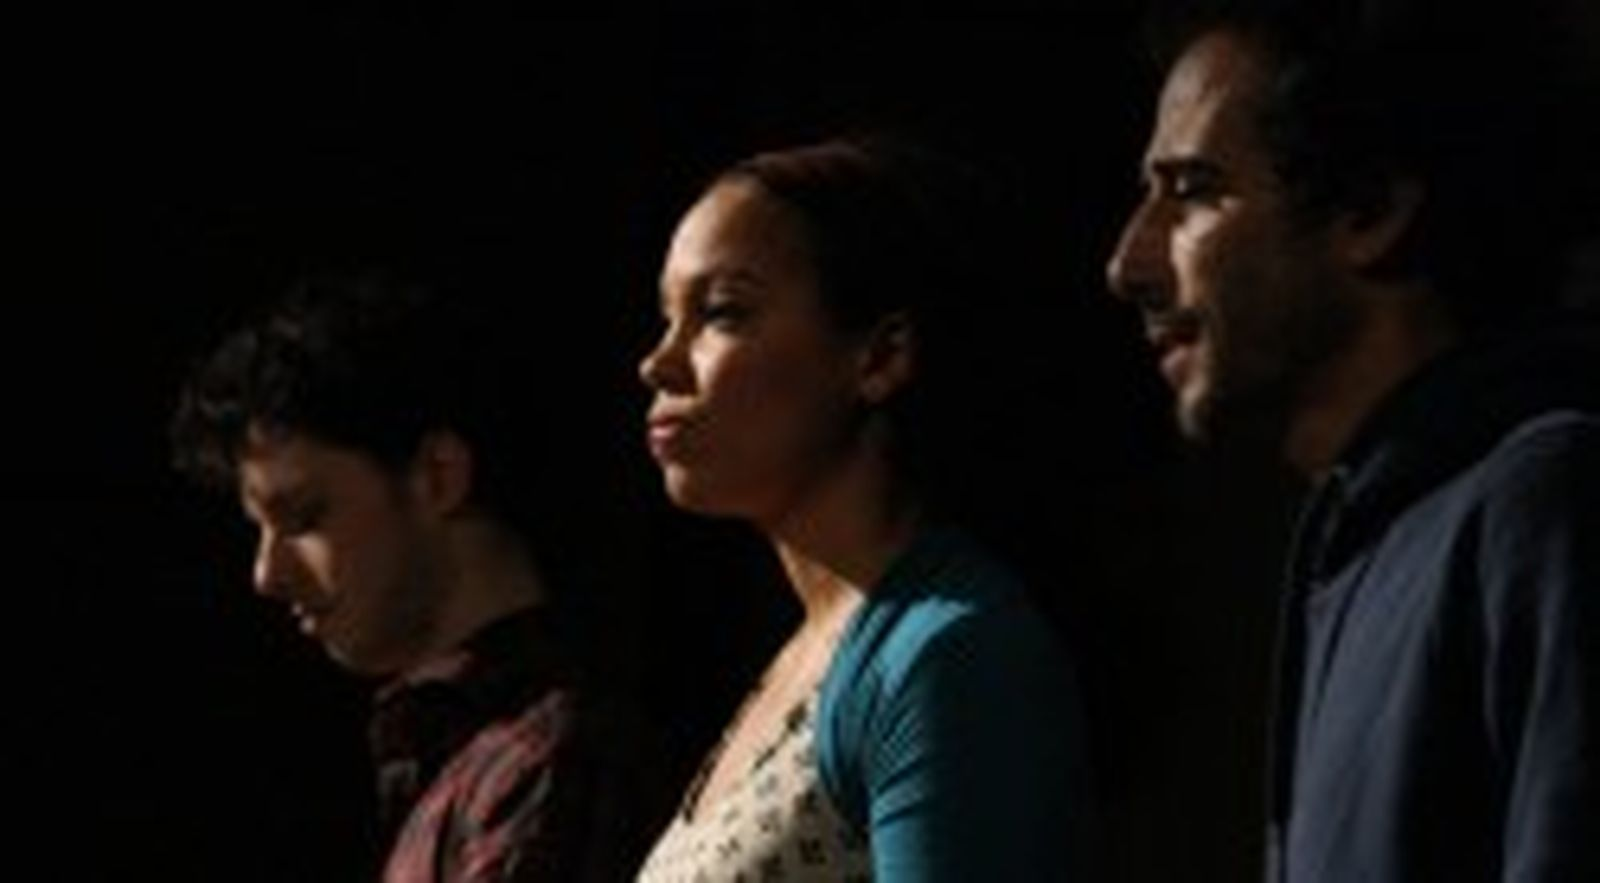 Szenenbild: Asylmonologe im Projekttheater